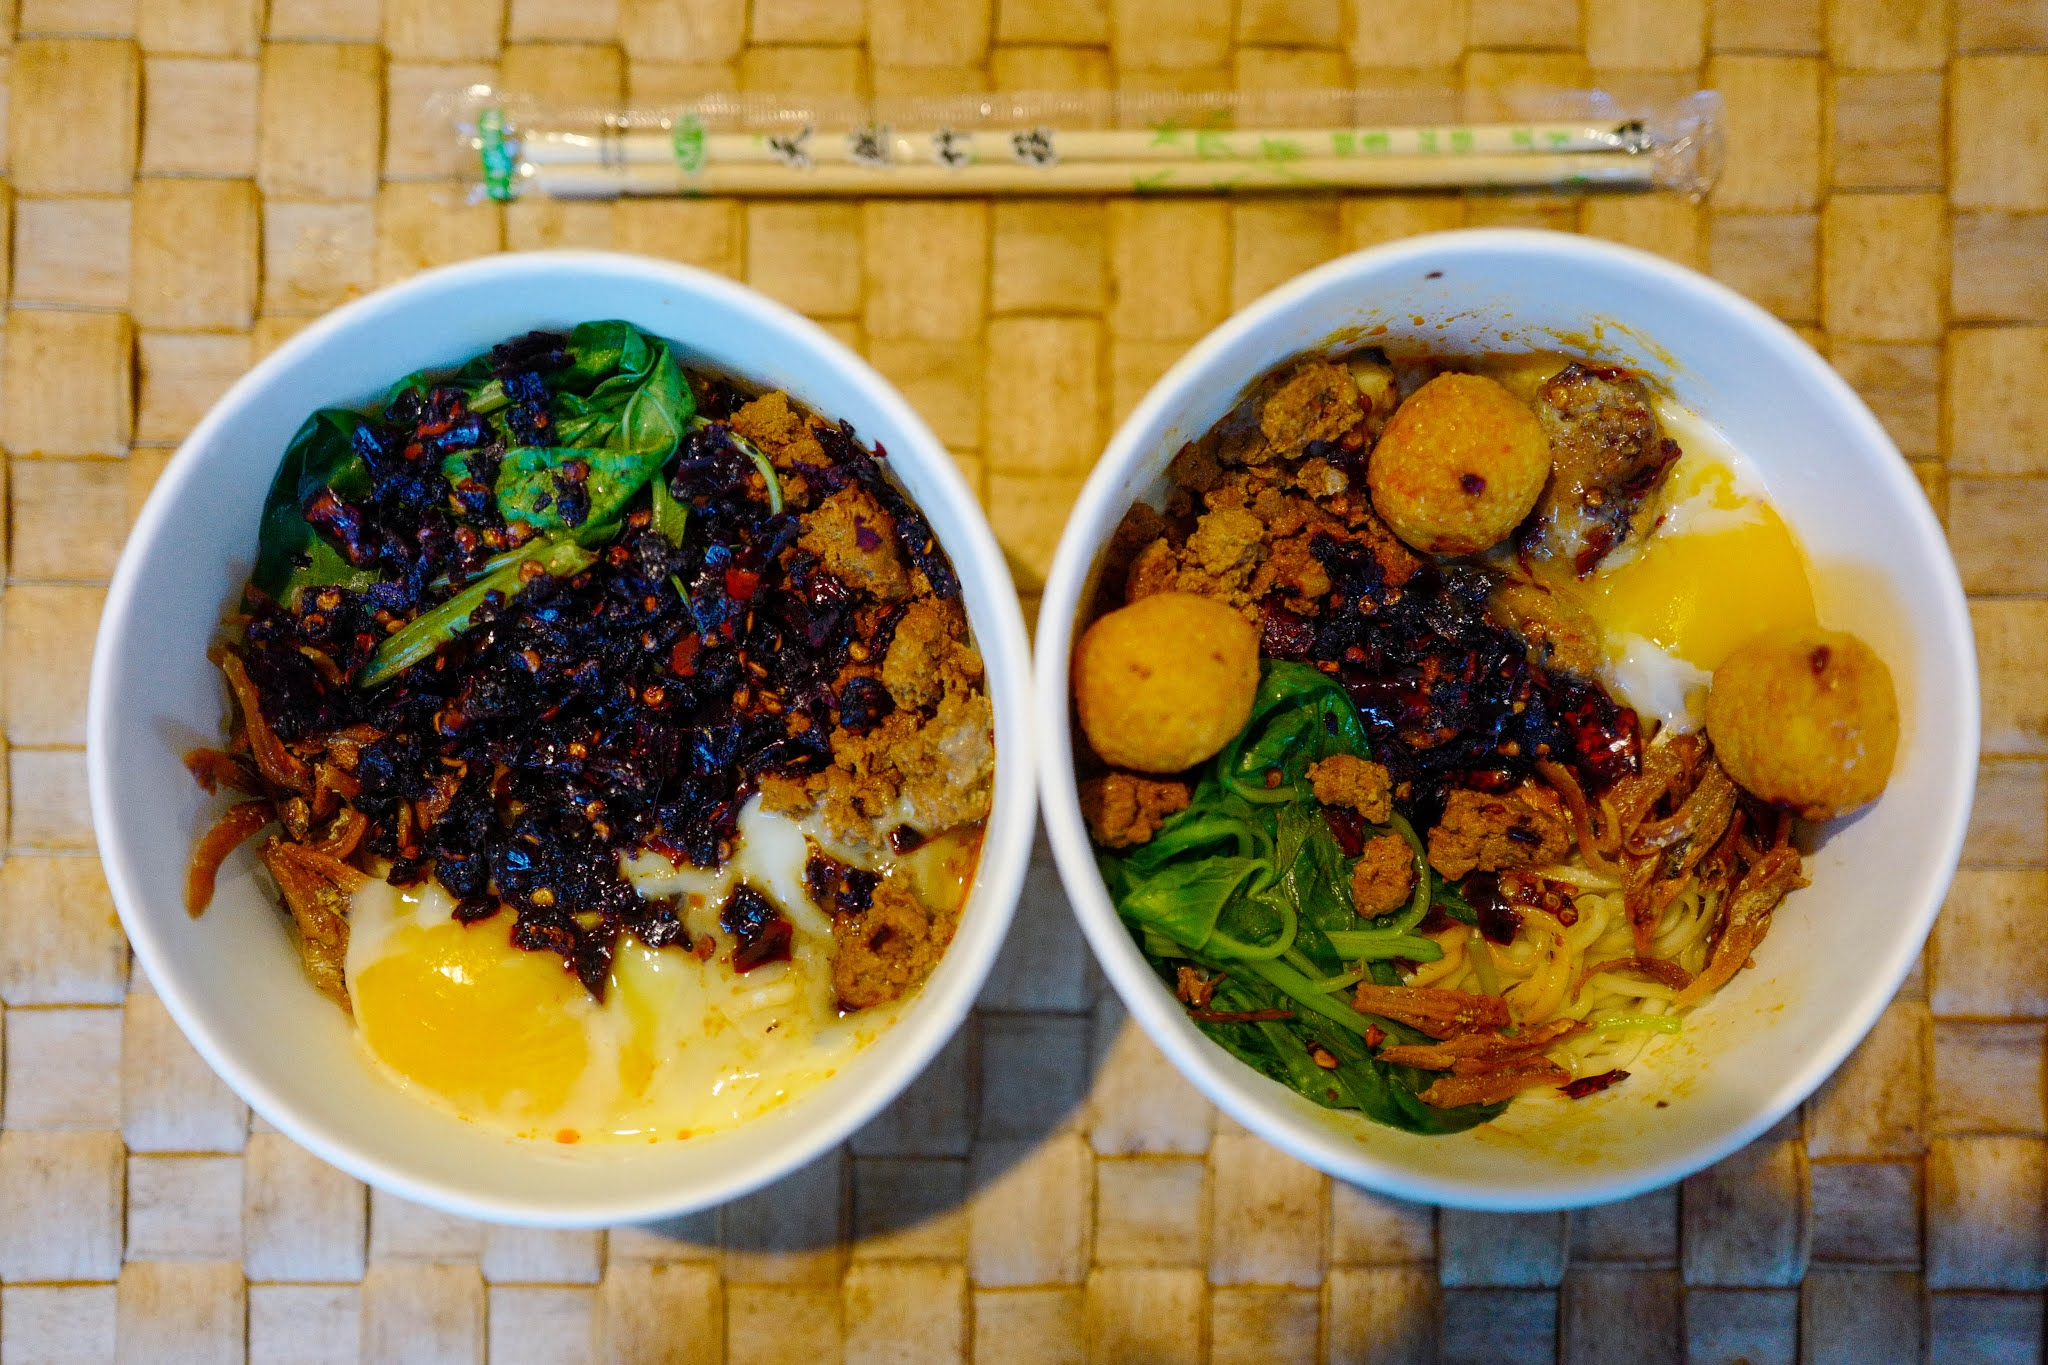 Mak Cik Wong: Chili Pan Mee Delivery